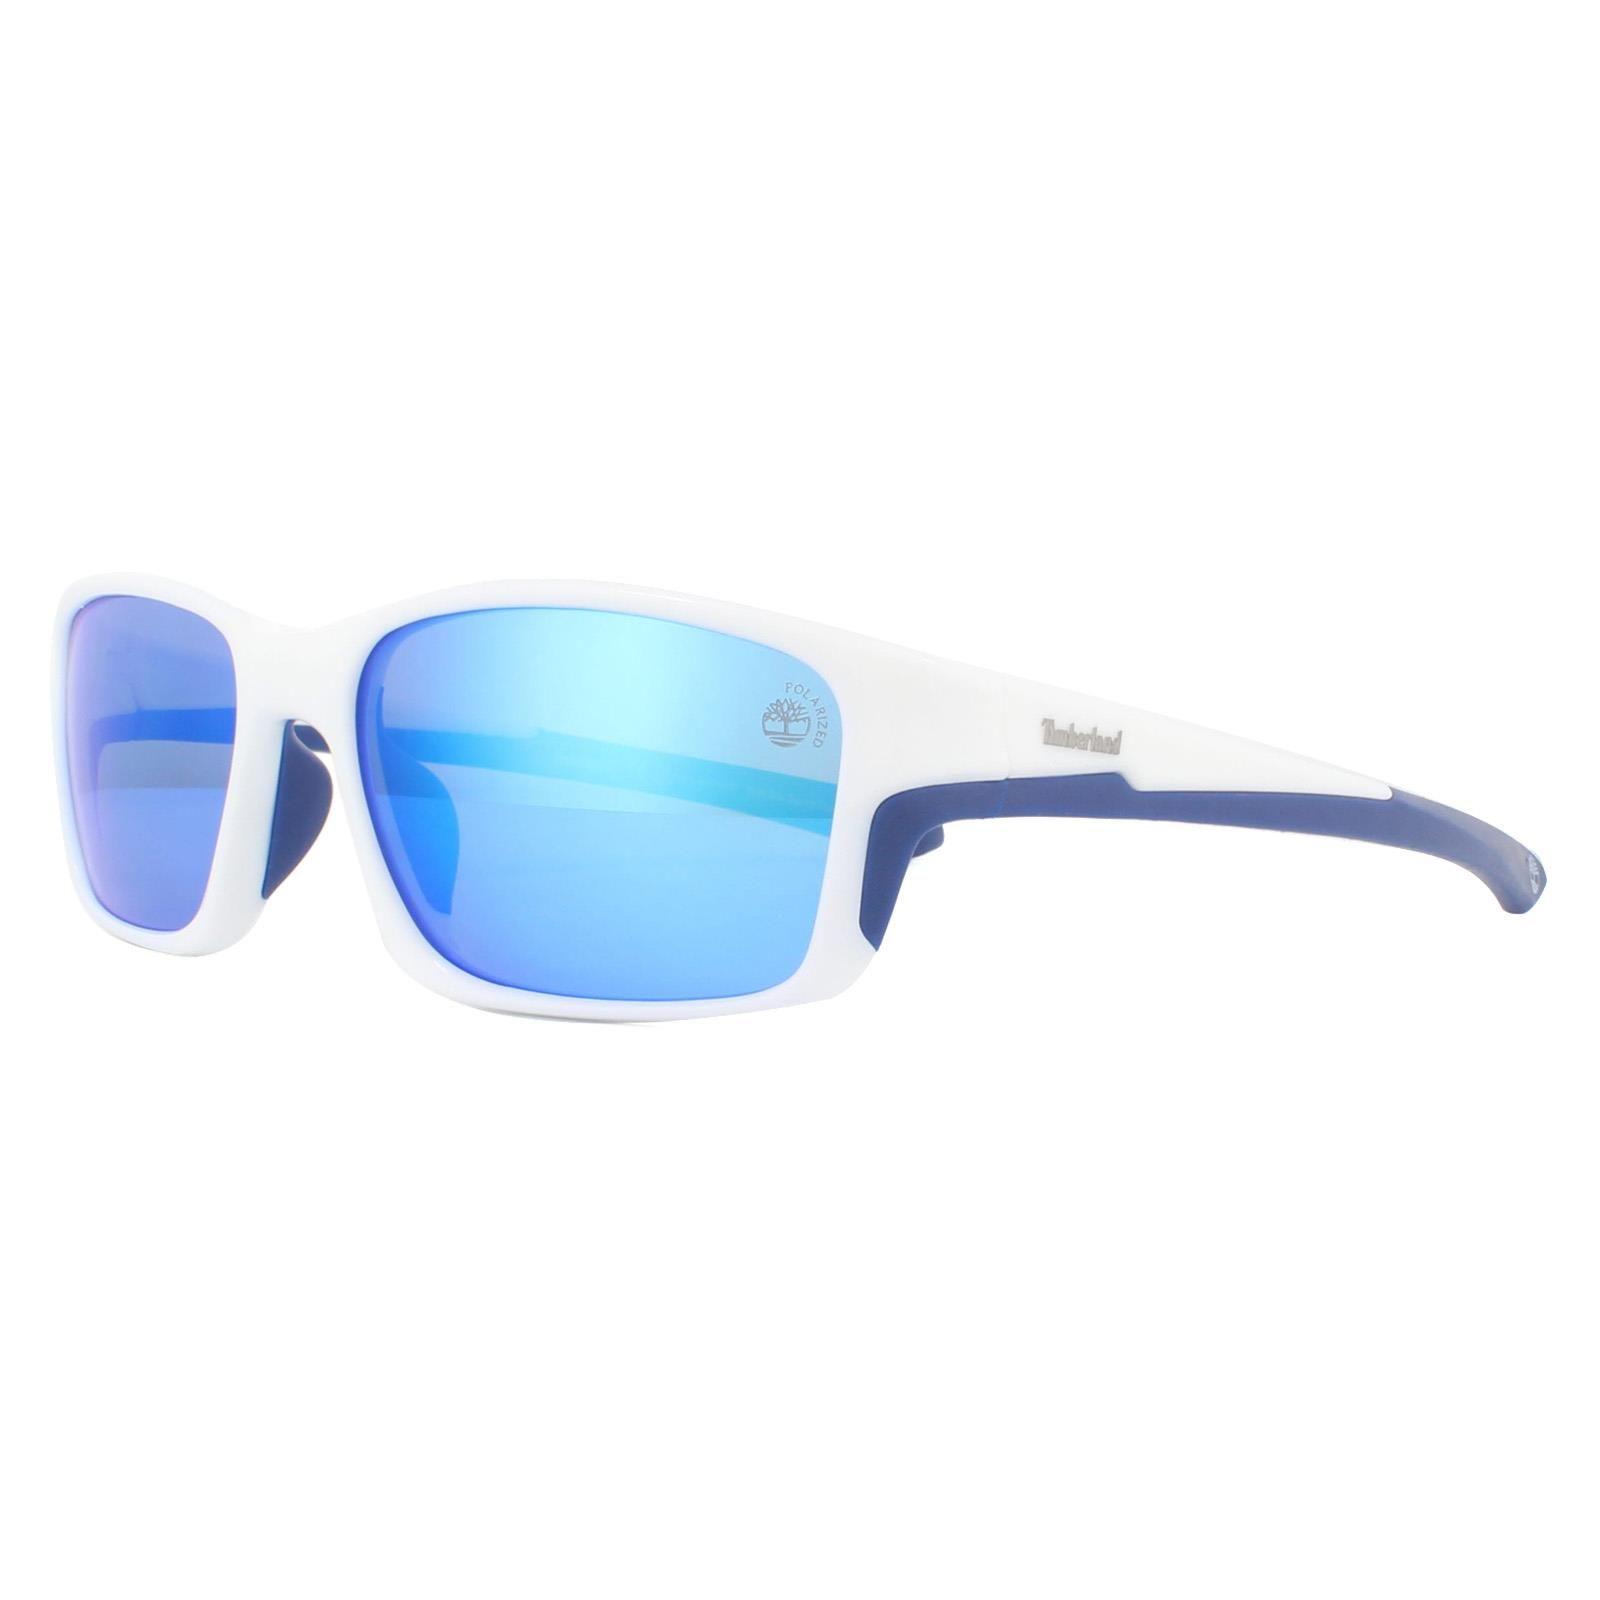 Timberland Sunglasses TB9172 21D White Blue Mirror Polarized